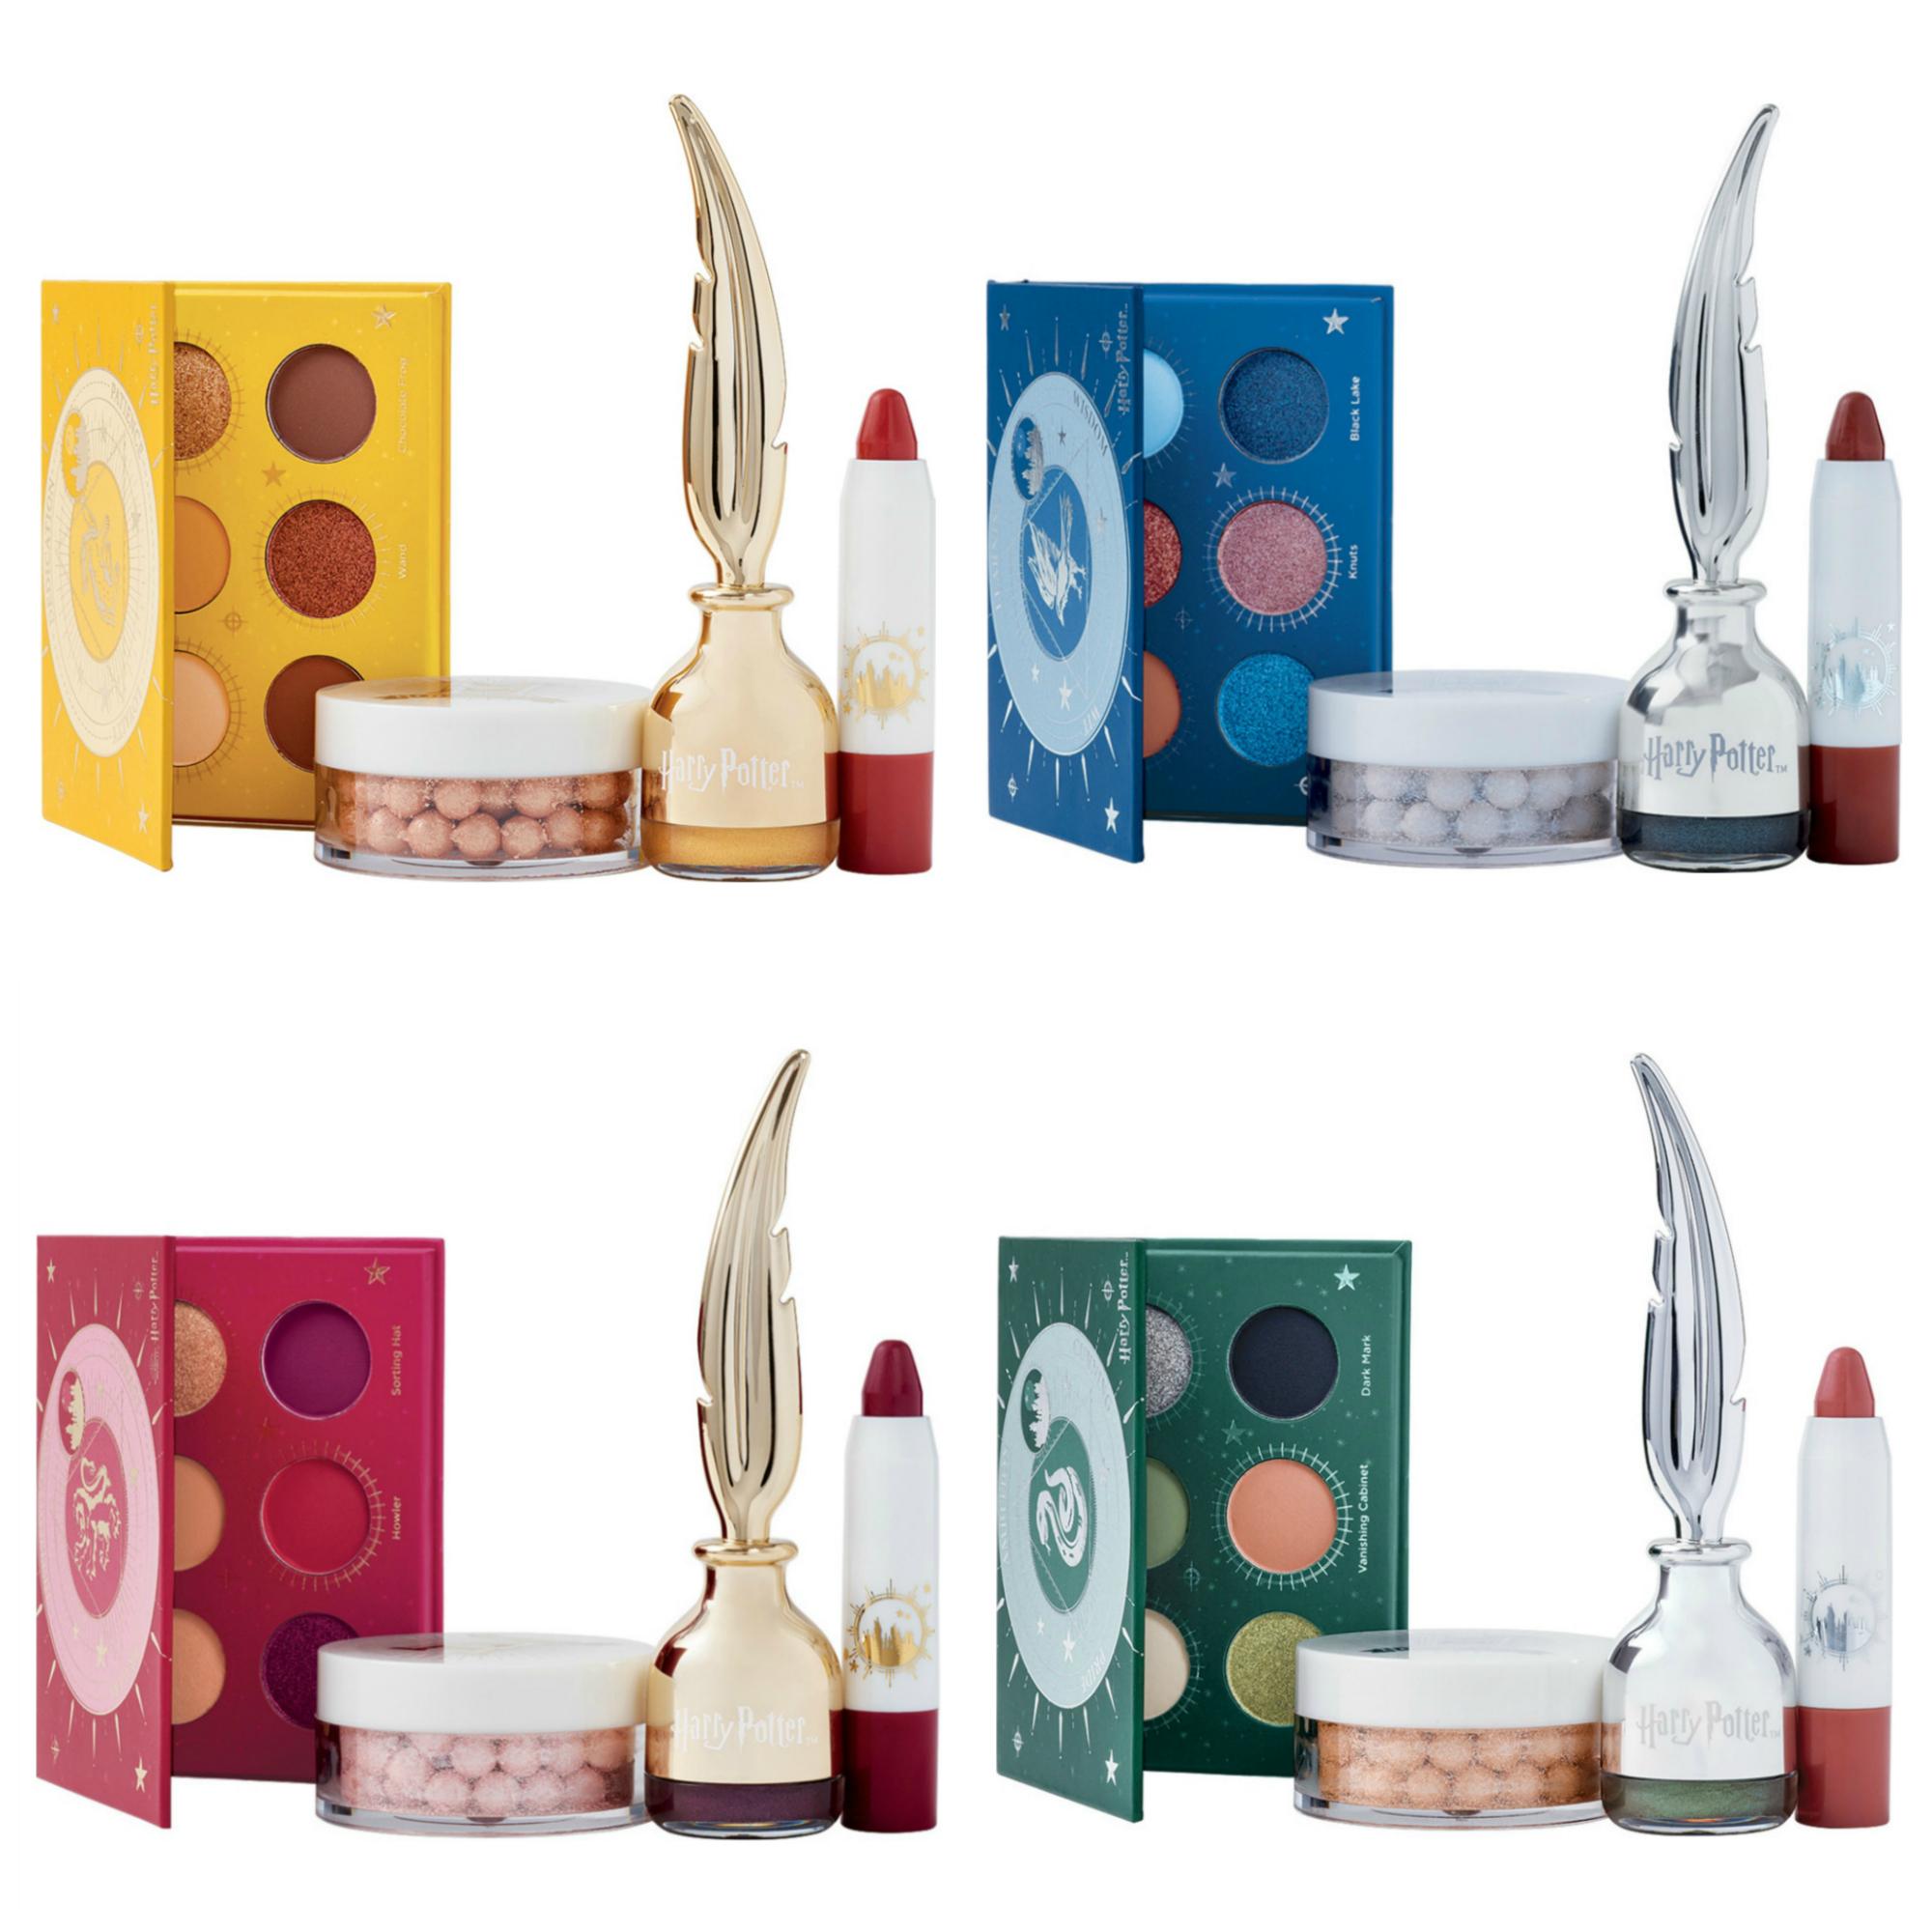 Harry Potter X Ulta Beauty Box Collection